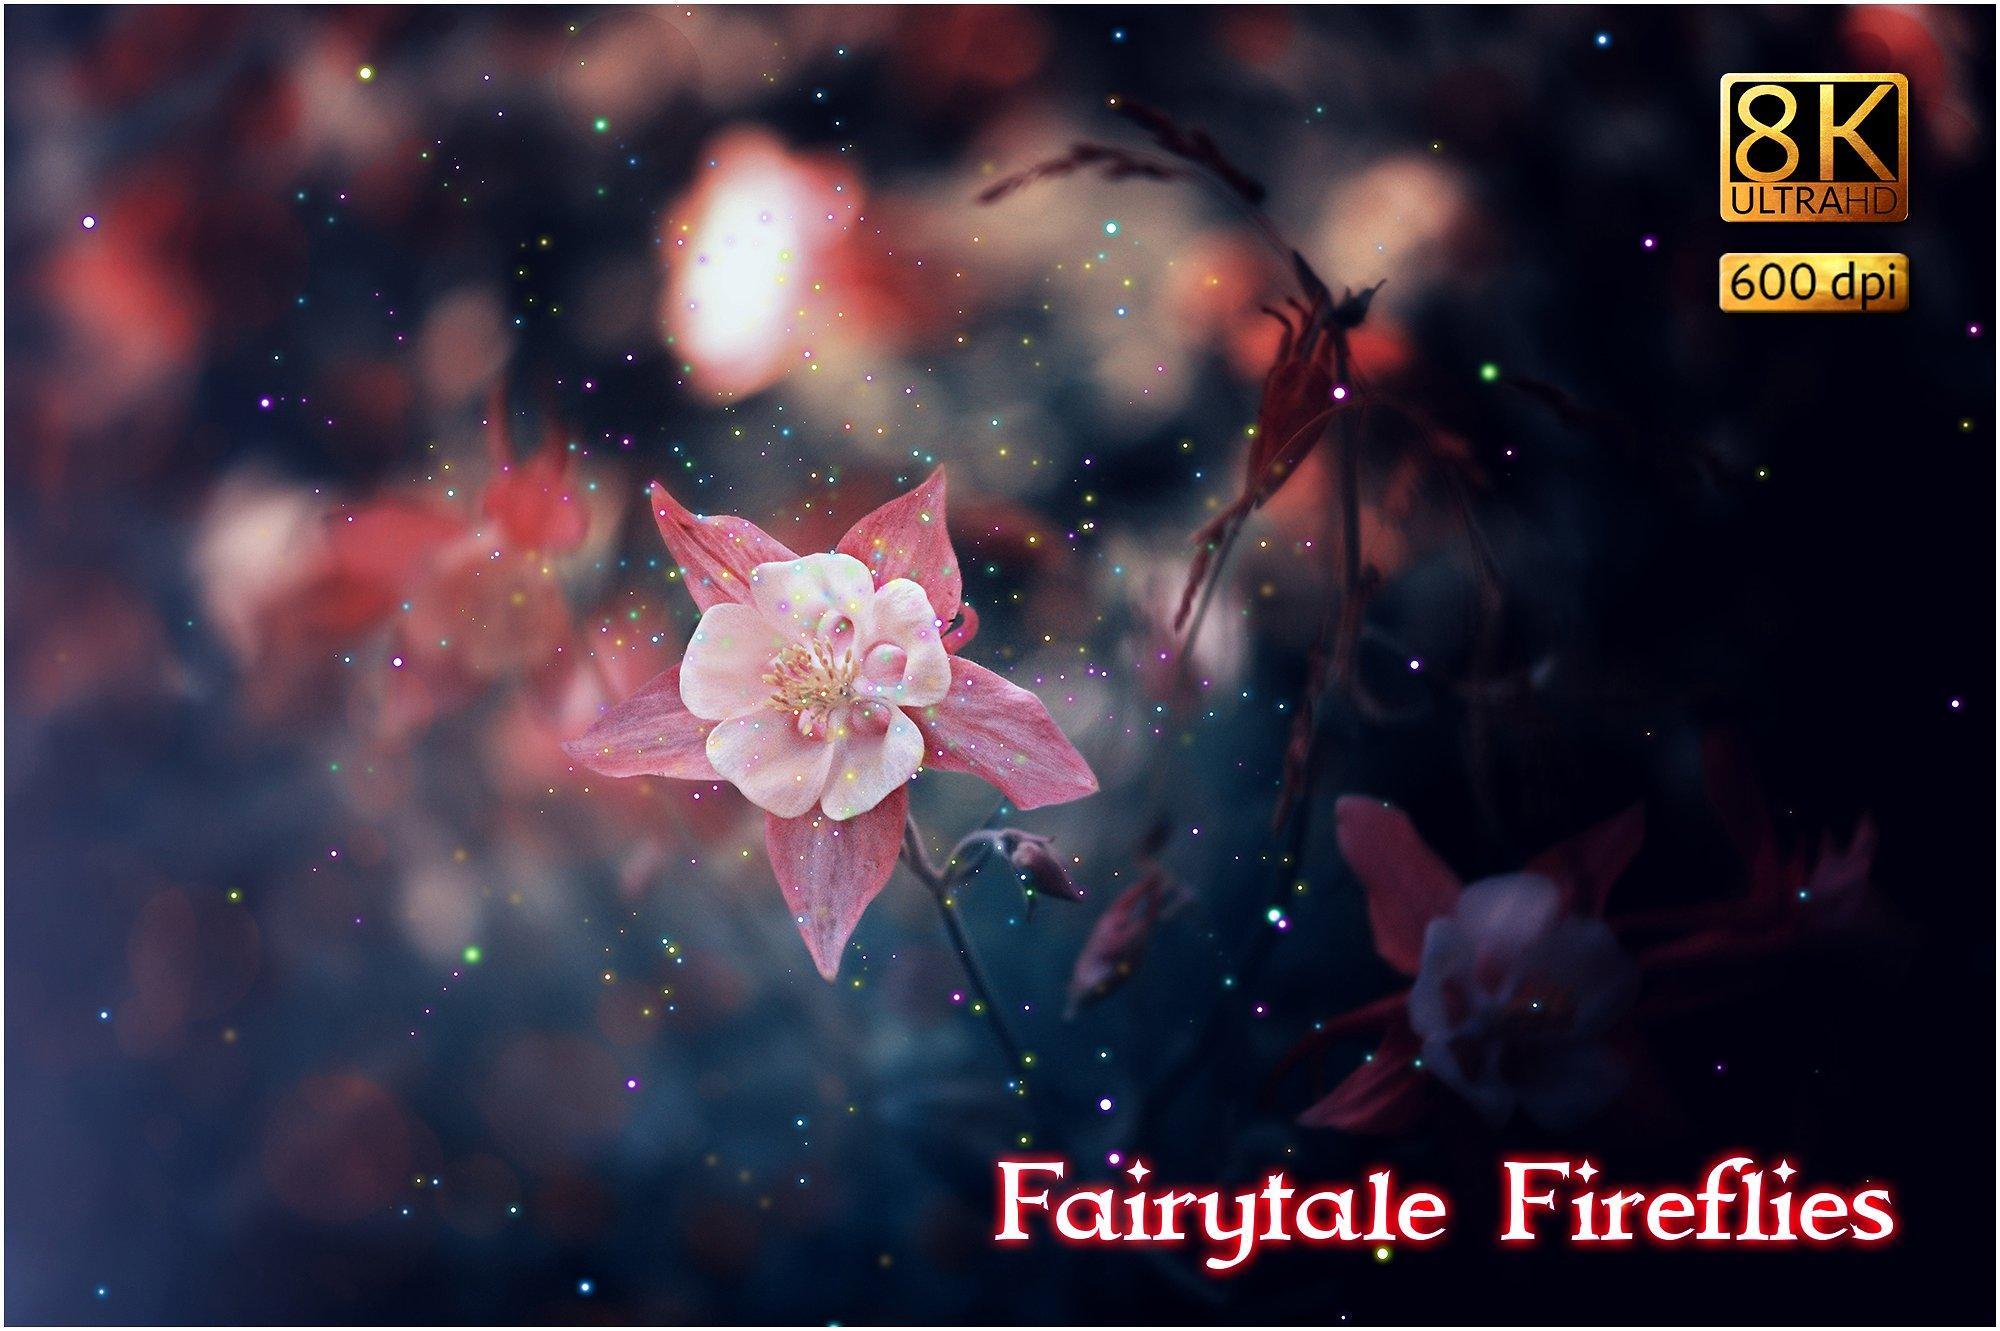 【S398】8K超高清童话萤火虫覆叠加图层样式30p 8K Fairytale Fireflies Overlays